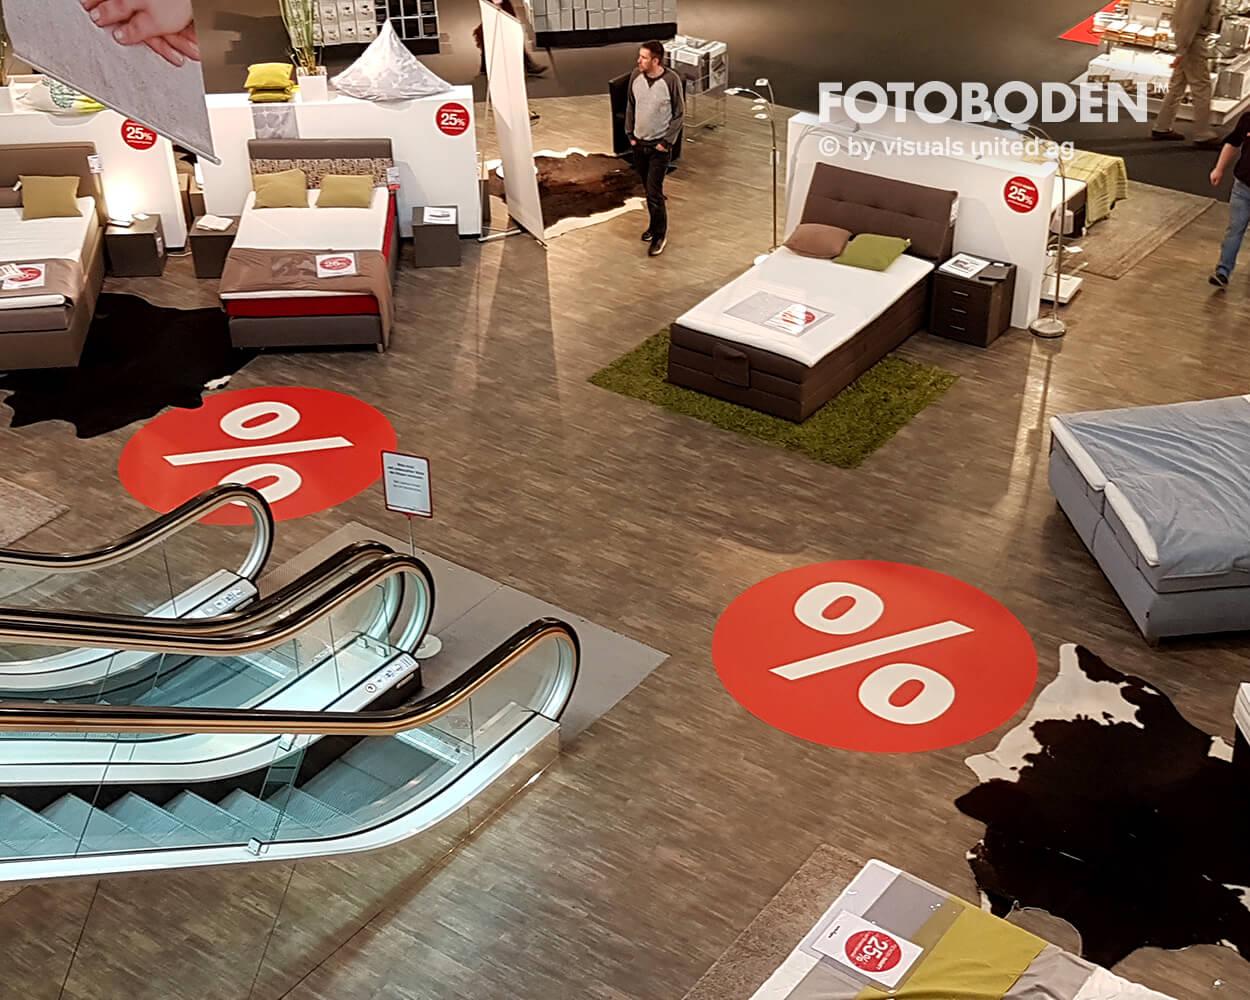 VMZB5 Fotoboden Flooring Fußboden Bodengestaltung Floorminder Bodendruck Werbung Fußbodenwerbung Bodenwerbung Merchandising Advertising